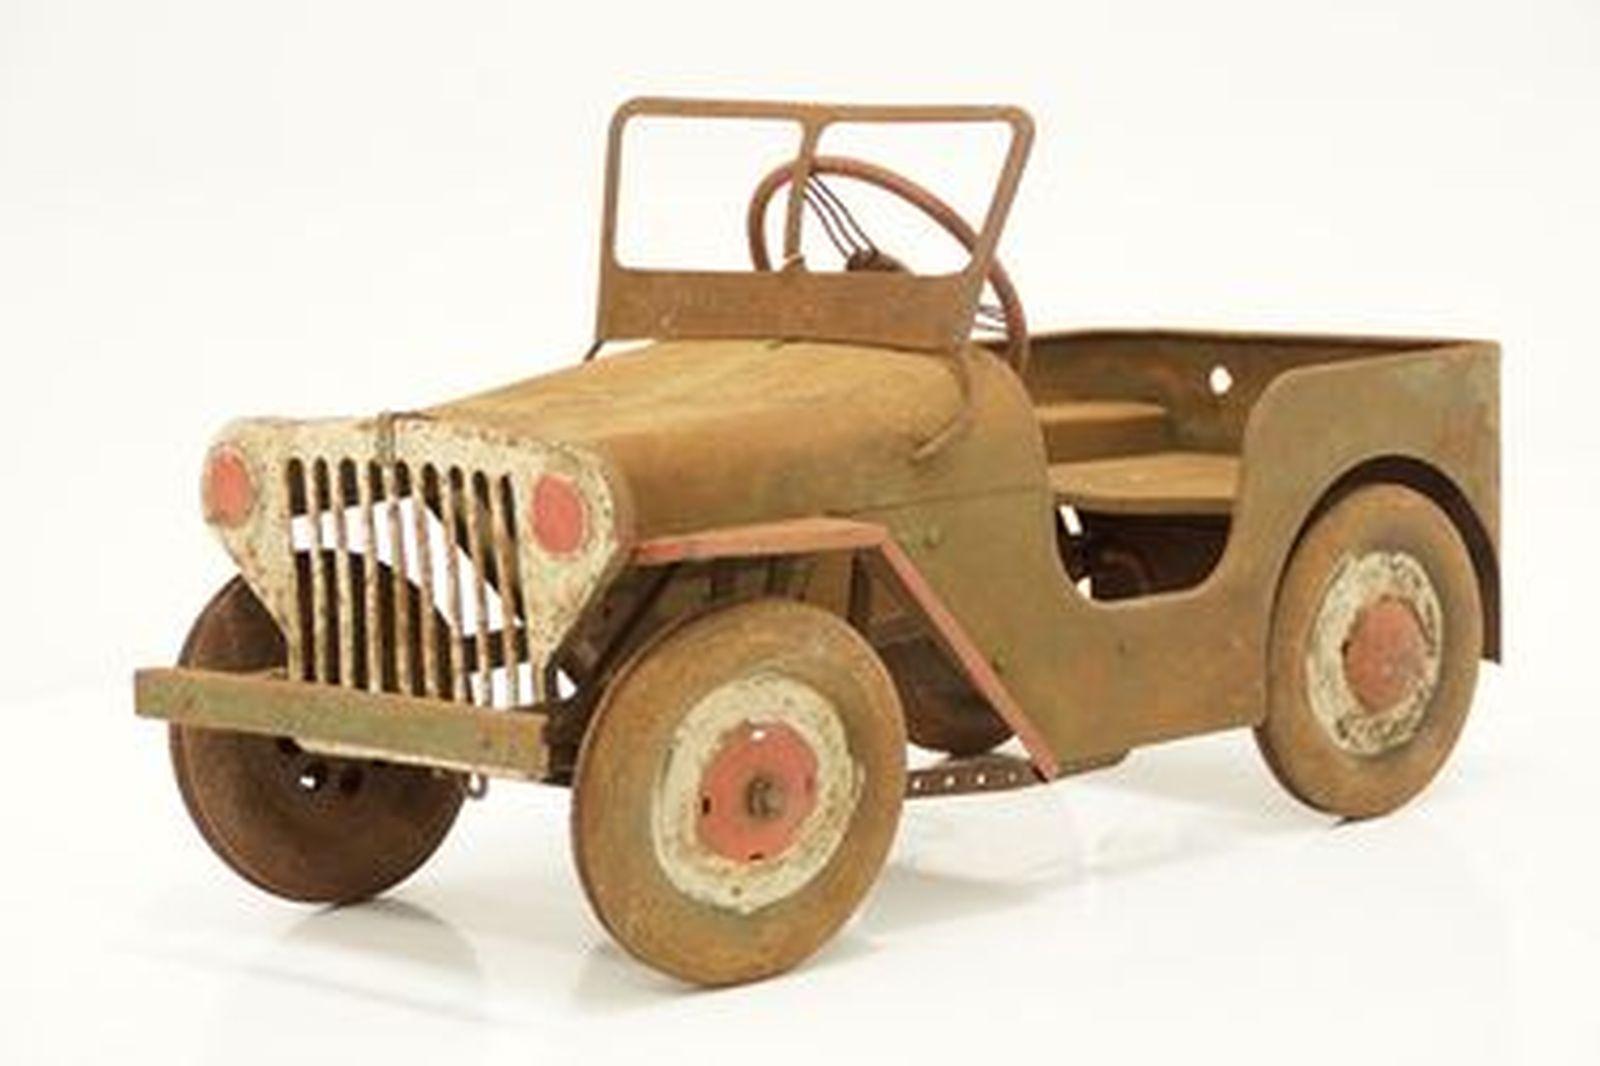 c1950's Jeep Pedal Car (Unrestored)